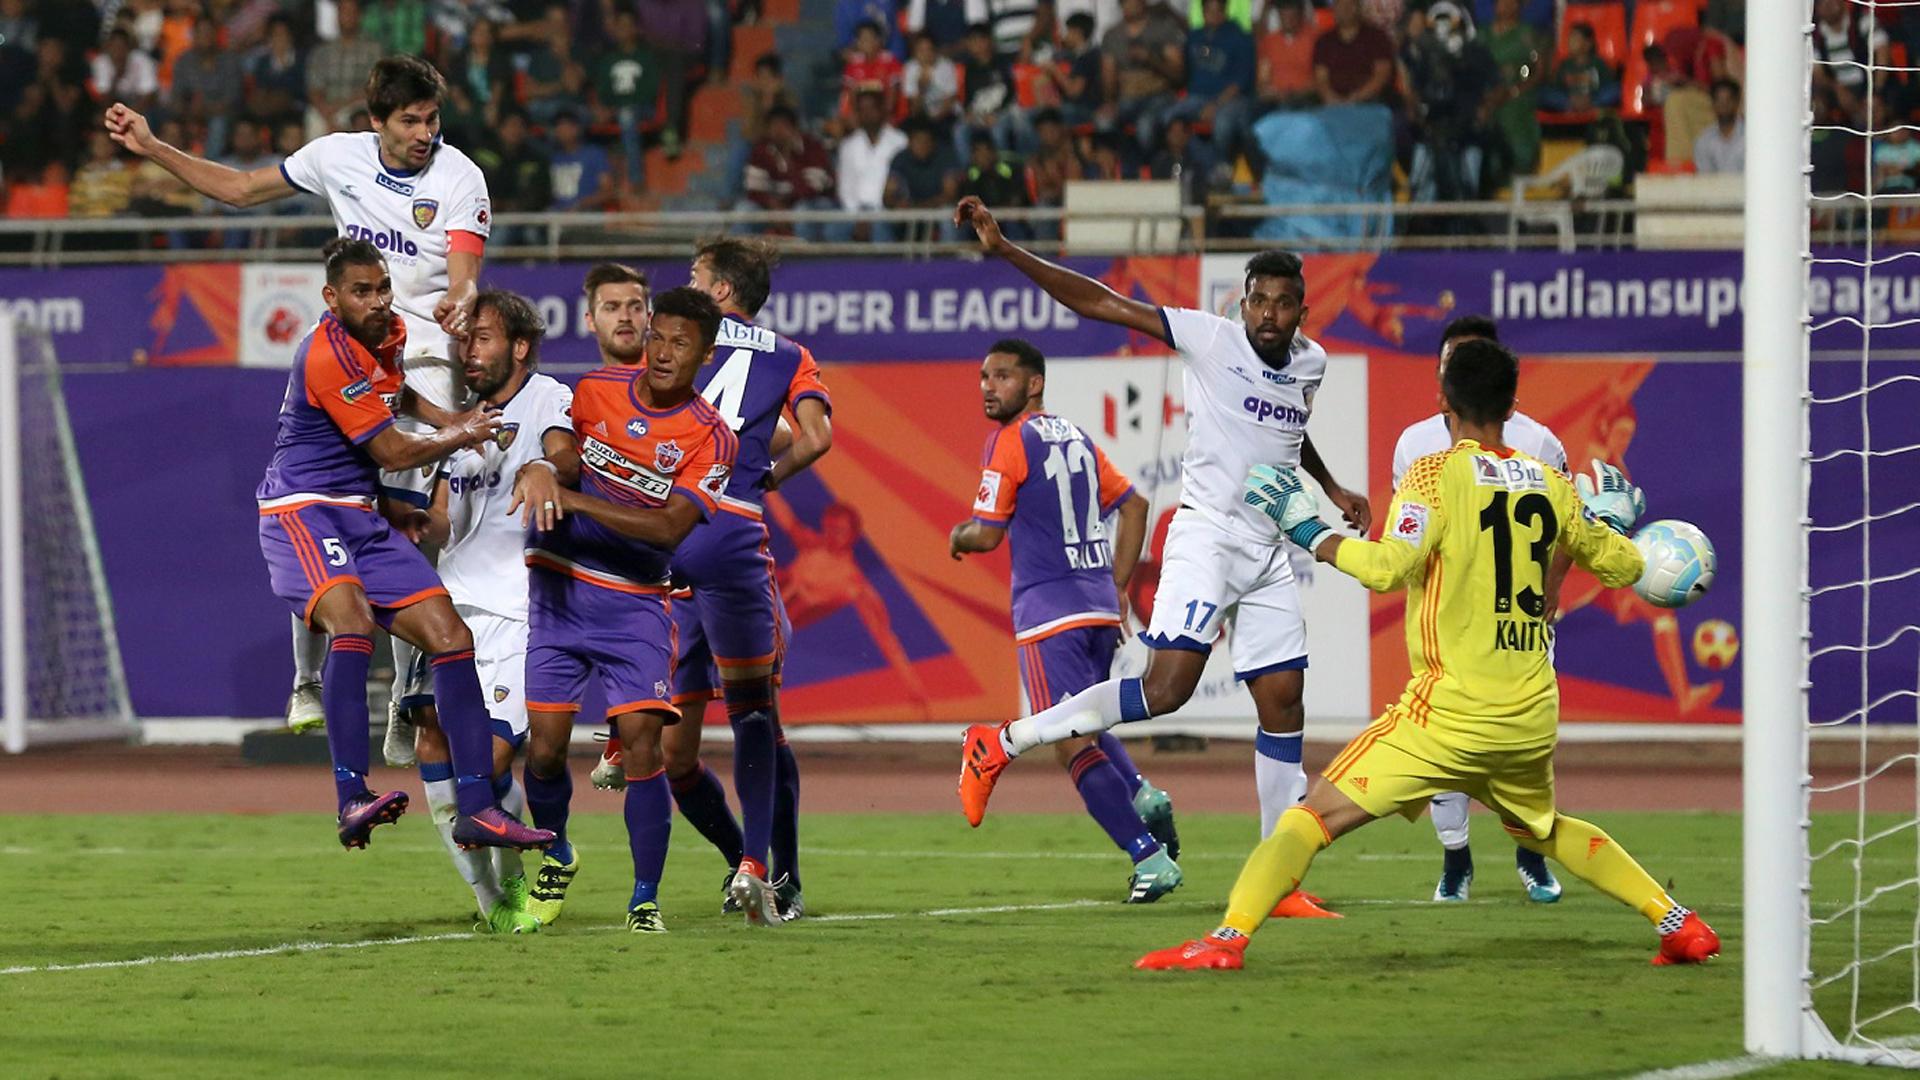 FC Pune City Chennaiyin FC ISL season 4 2017/2018